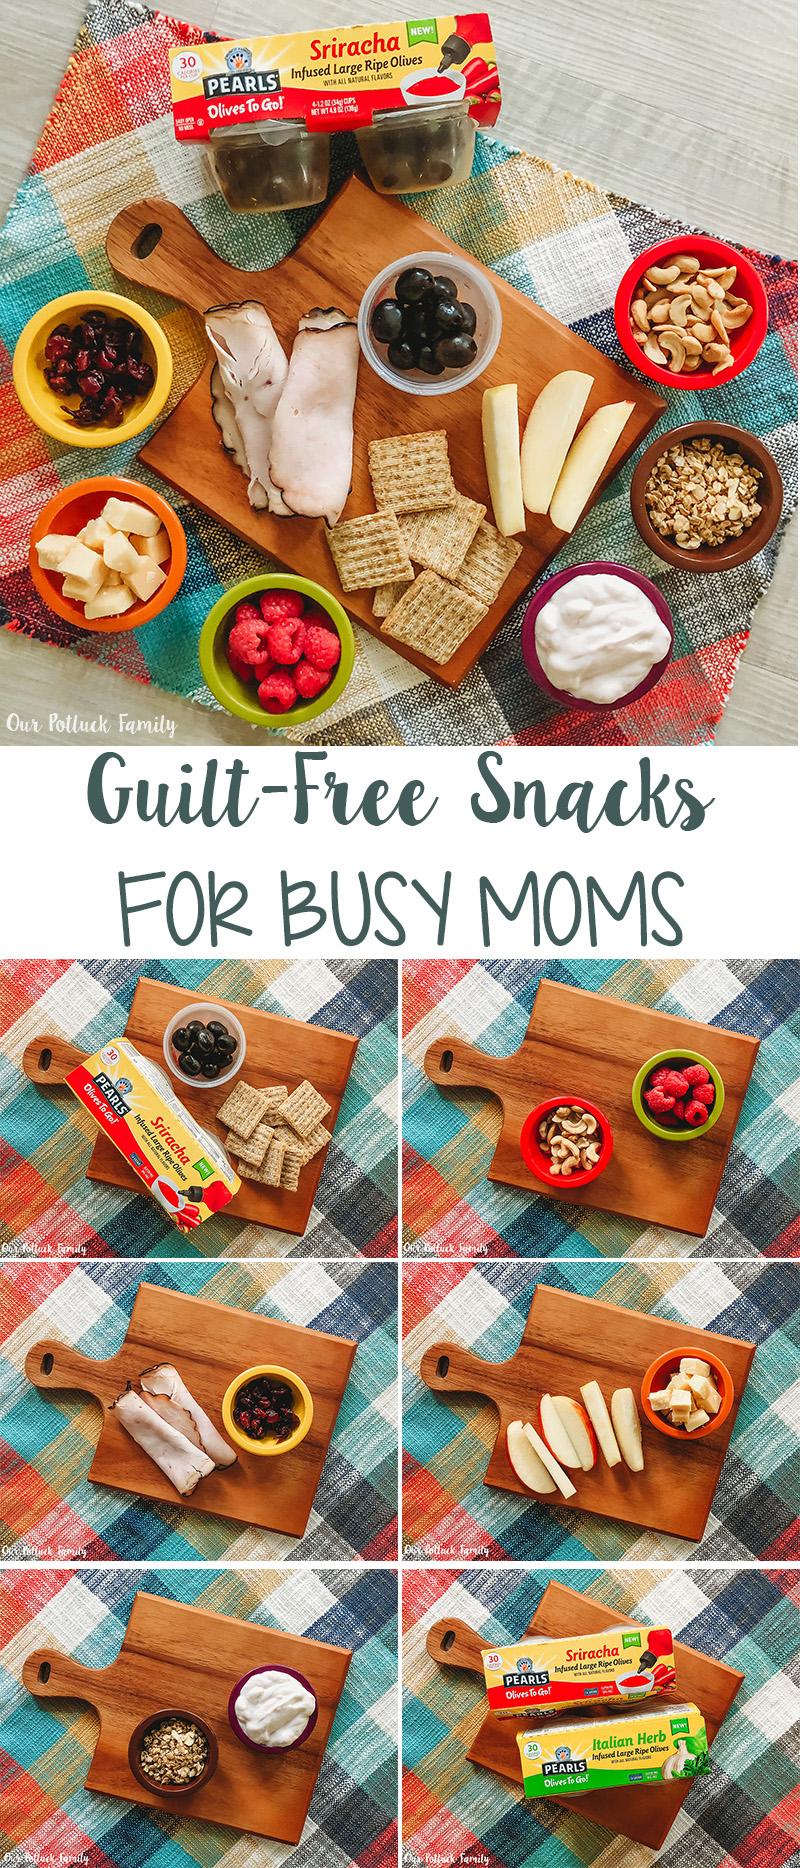 Guilt-Free Snacks for Busy Moms